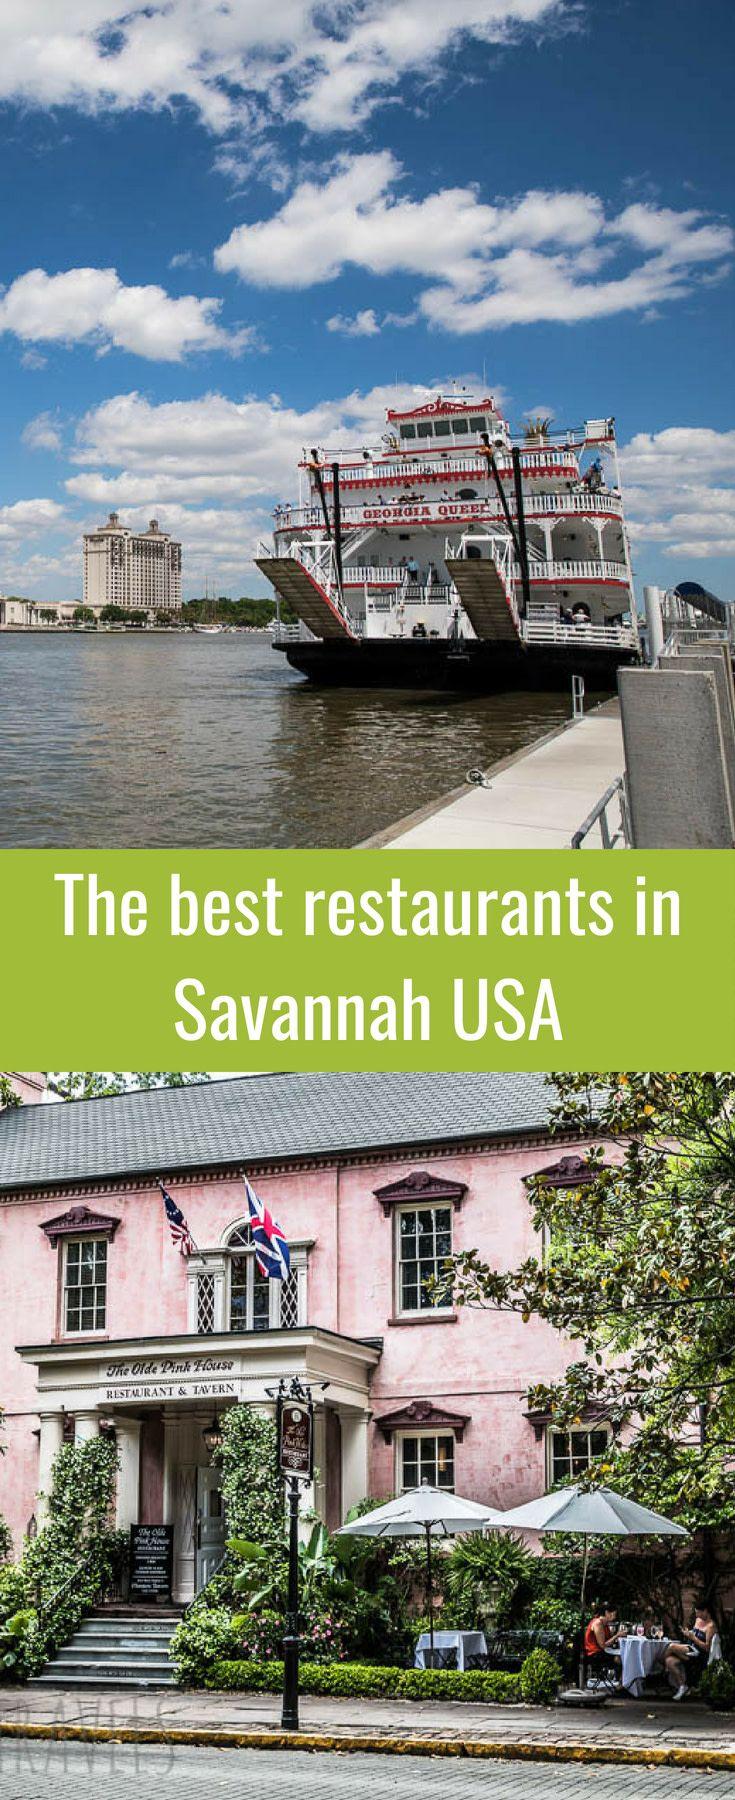 The 10 Best Restaurants In Savannah Usa Savannah Chat